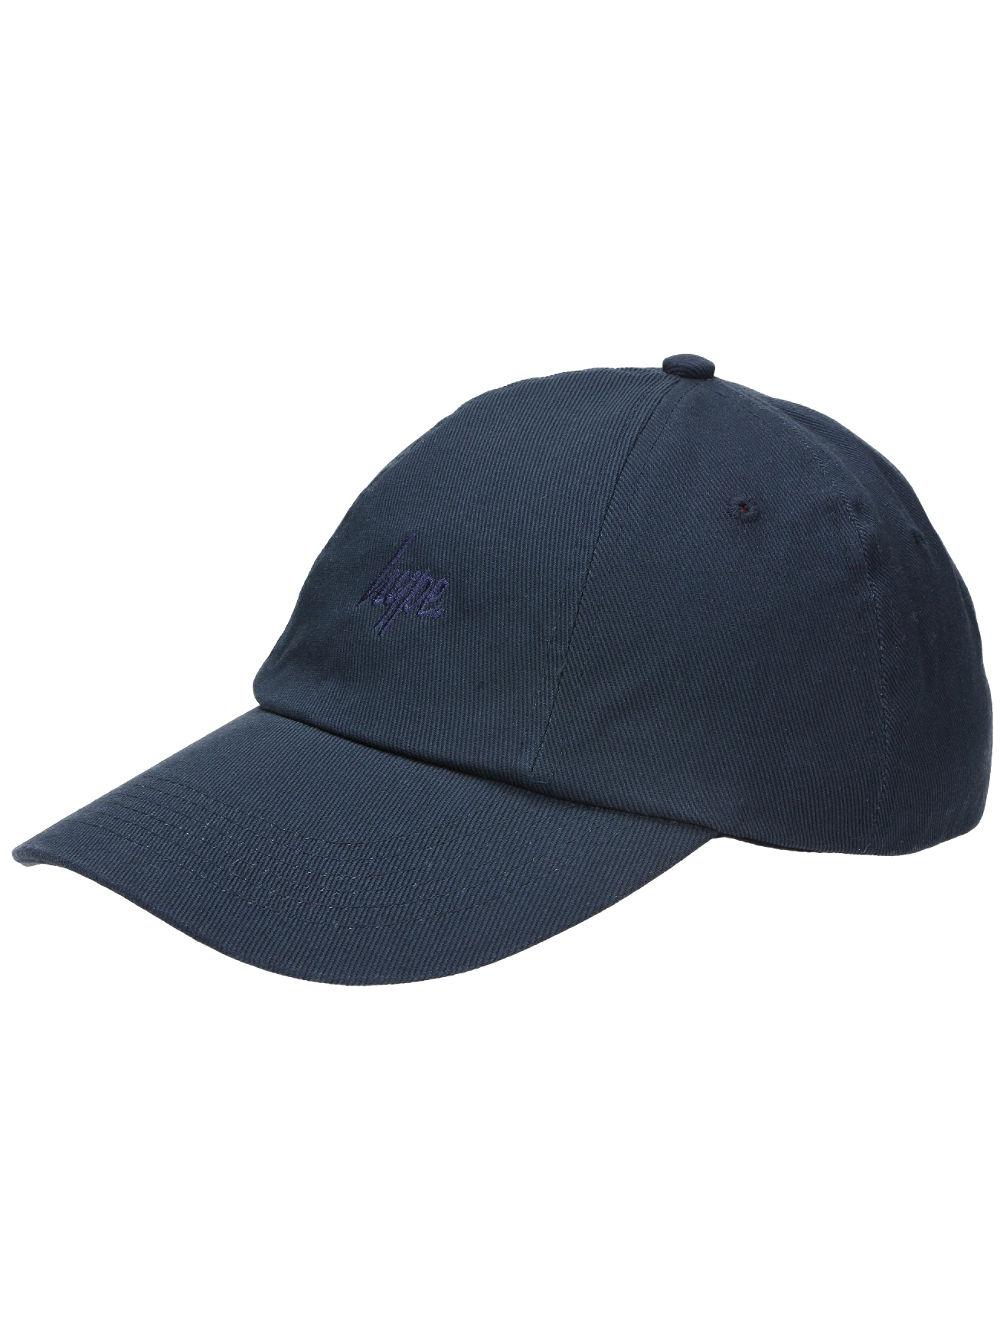 hype-script-cap